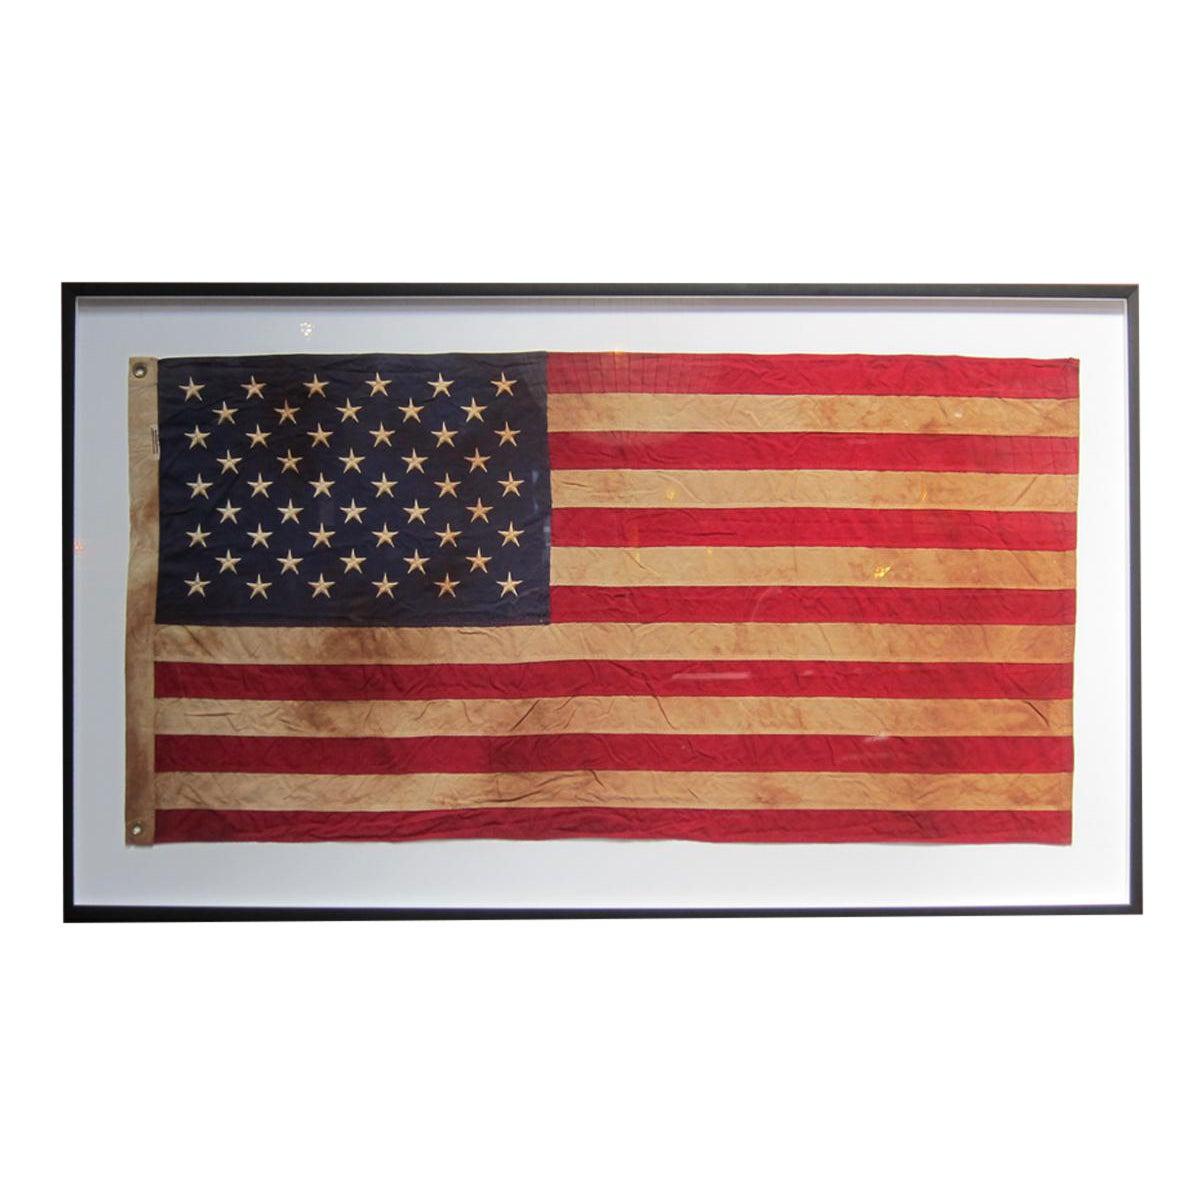 Framed Vintage American Flag | Chairish